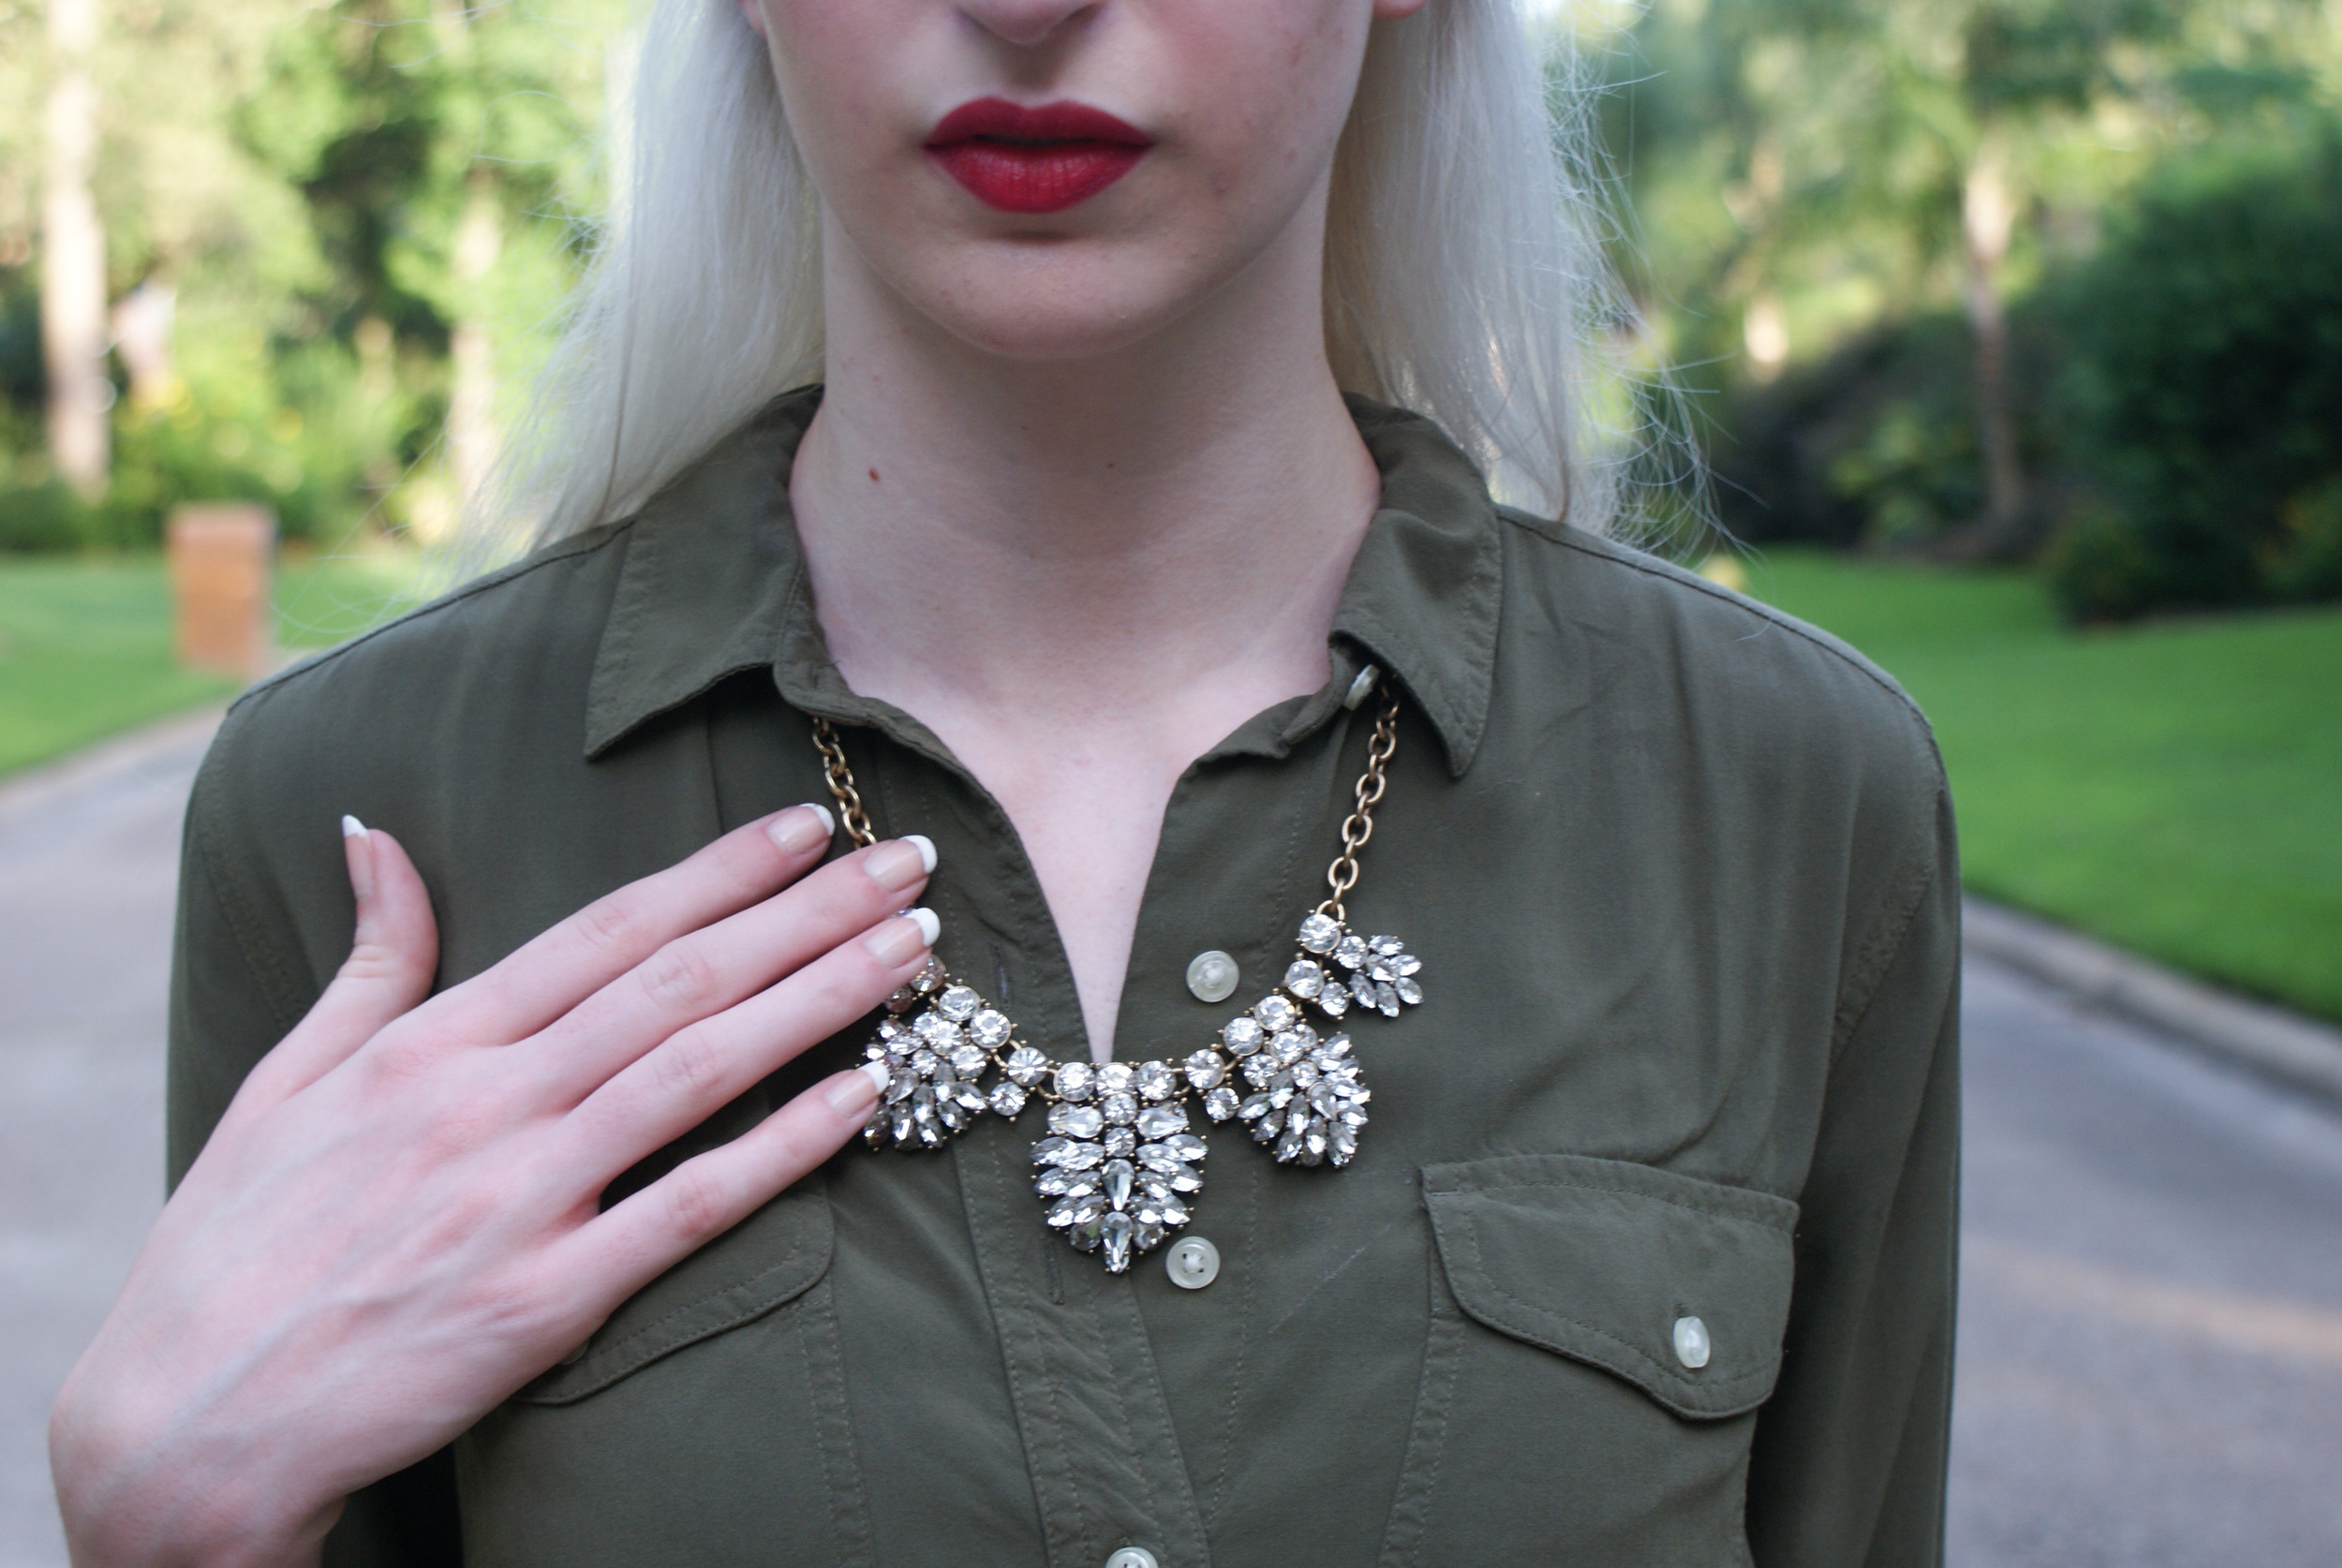 LOFT Army Green button down, J.Crew crystal statement necklace, brown block heel sandals, Kate spade cedar street maise, Urban Decay lipstick in F-Bomb